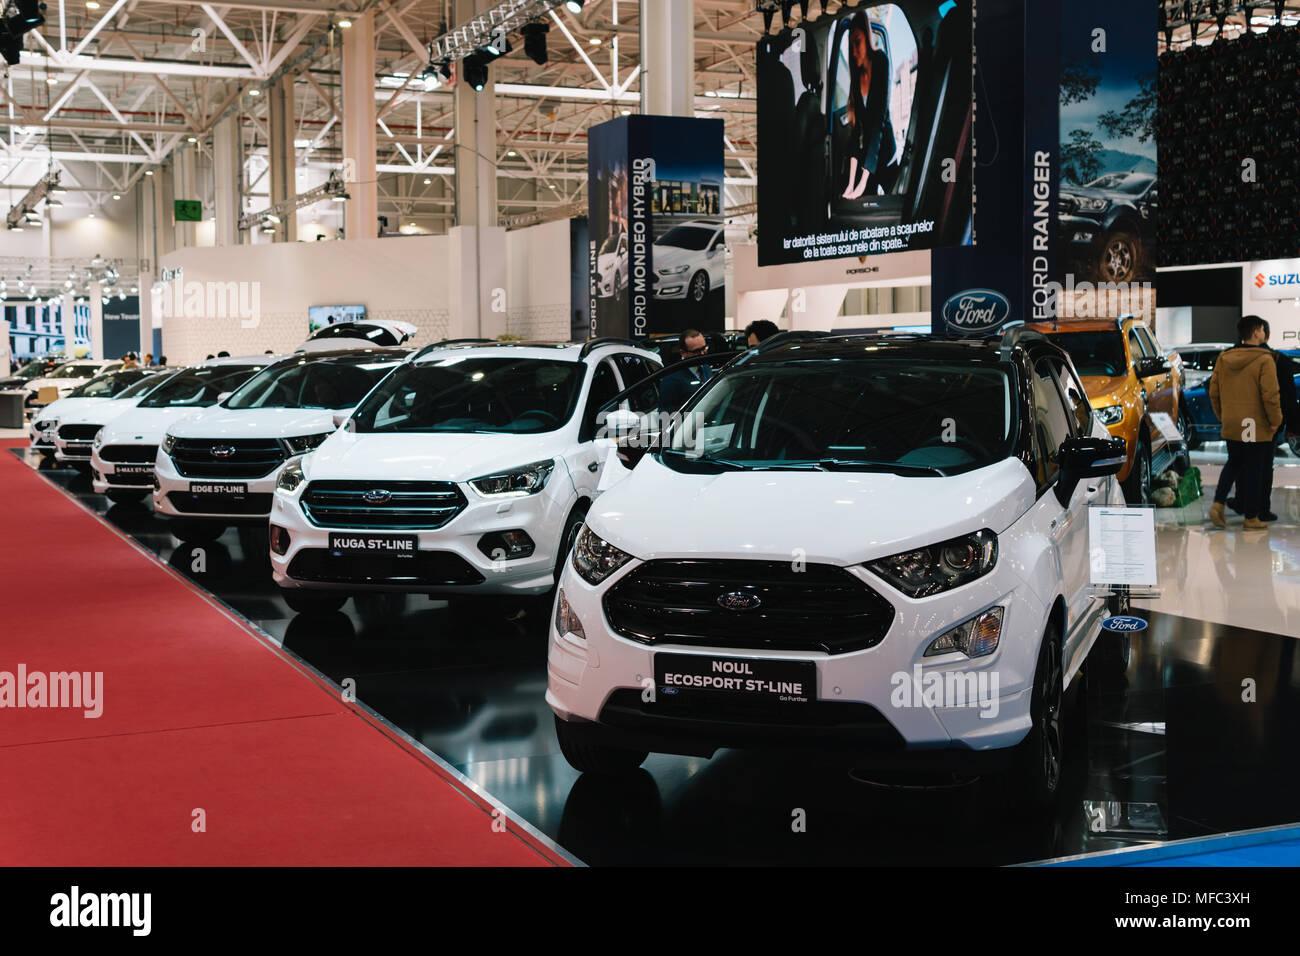 Bukarest, Rumänien - 28. MÄRZ 2018: Ford Autos in Bukarest International Auto Show Stockbild